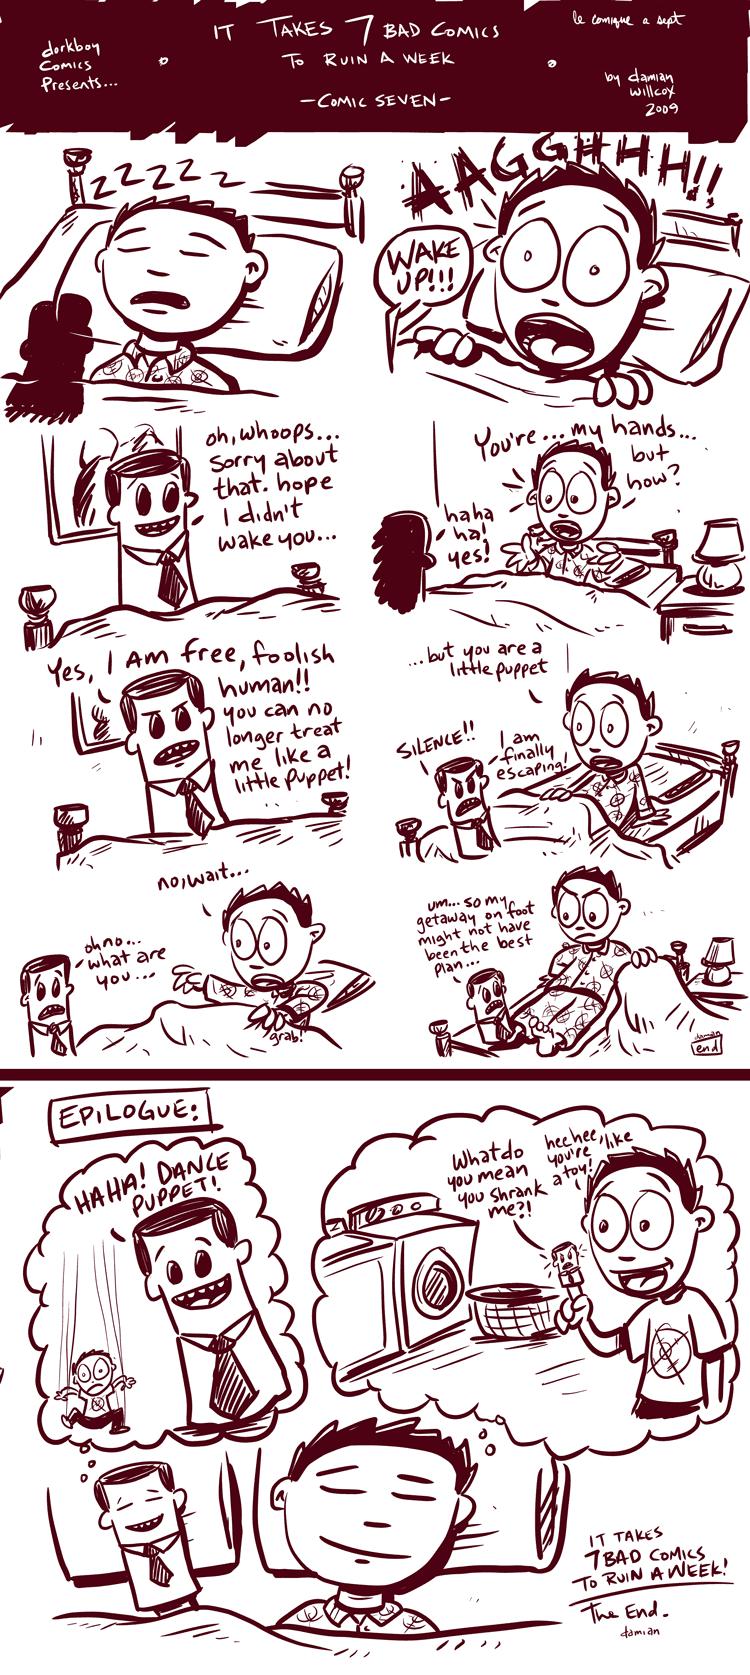 7 bad comics to ruin a week – #7